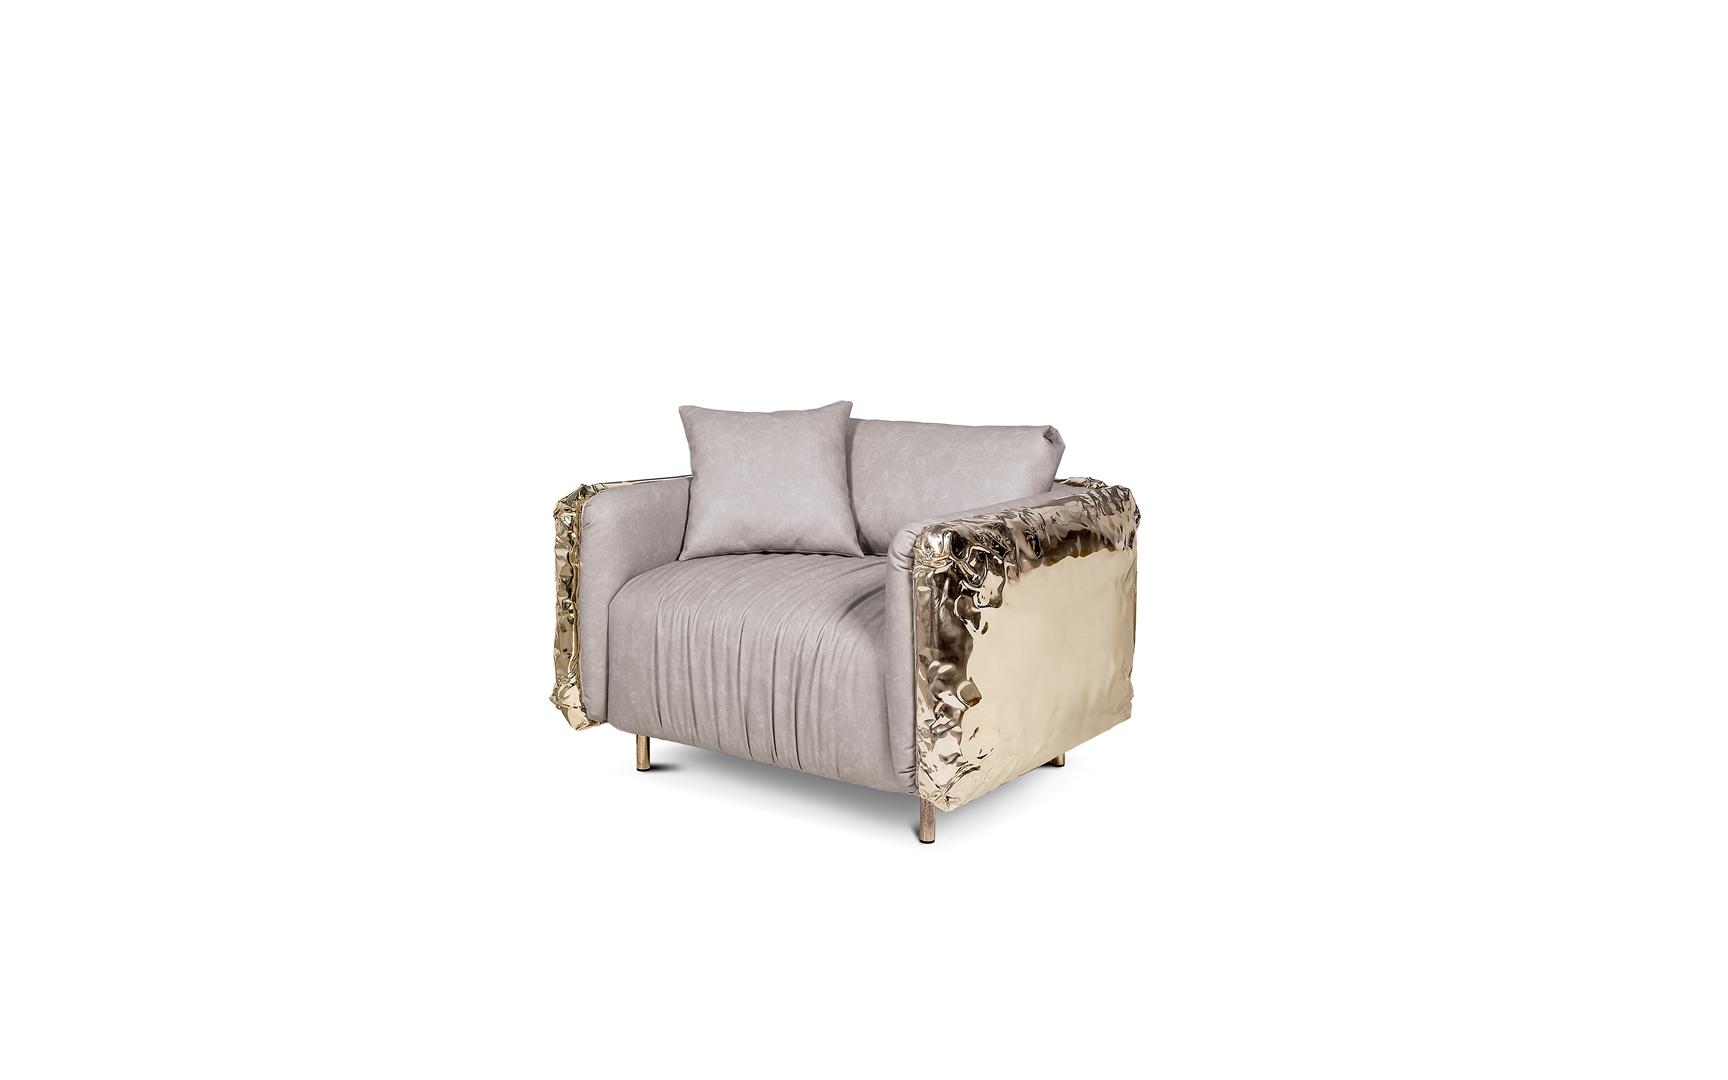 imperfectio-two-seats-sofa-02 (Copy)